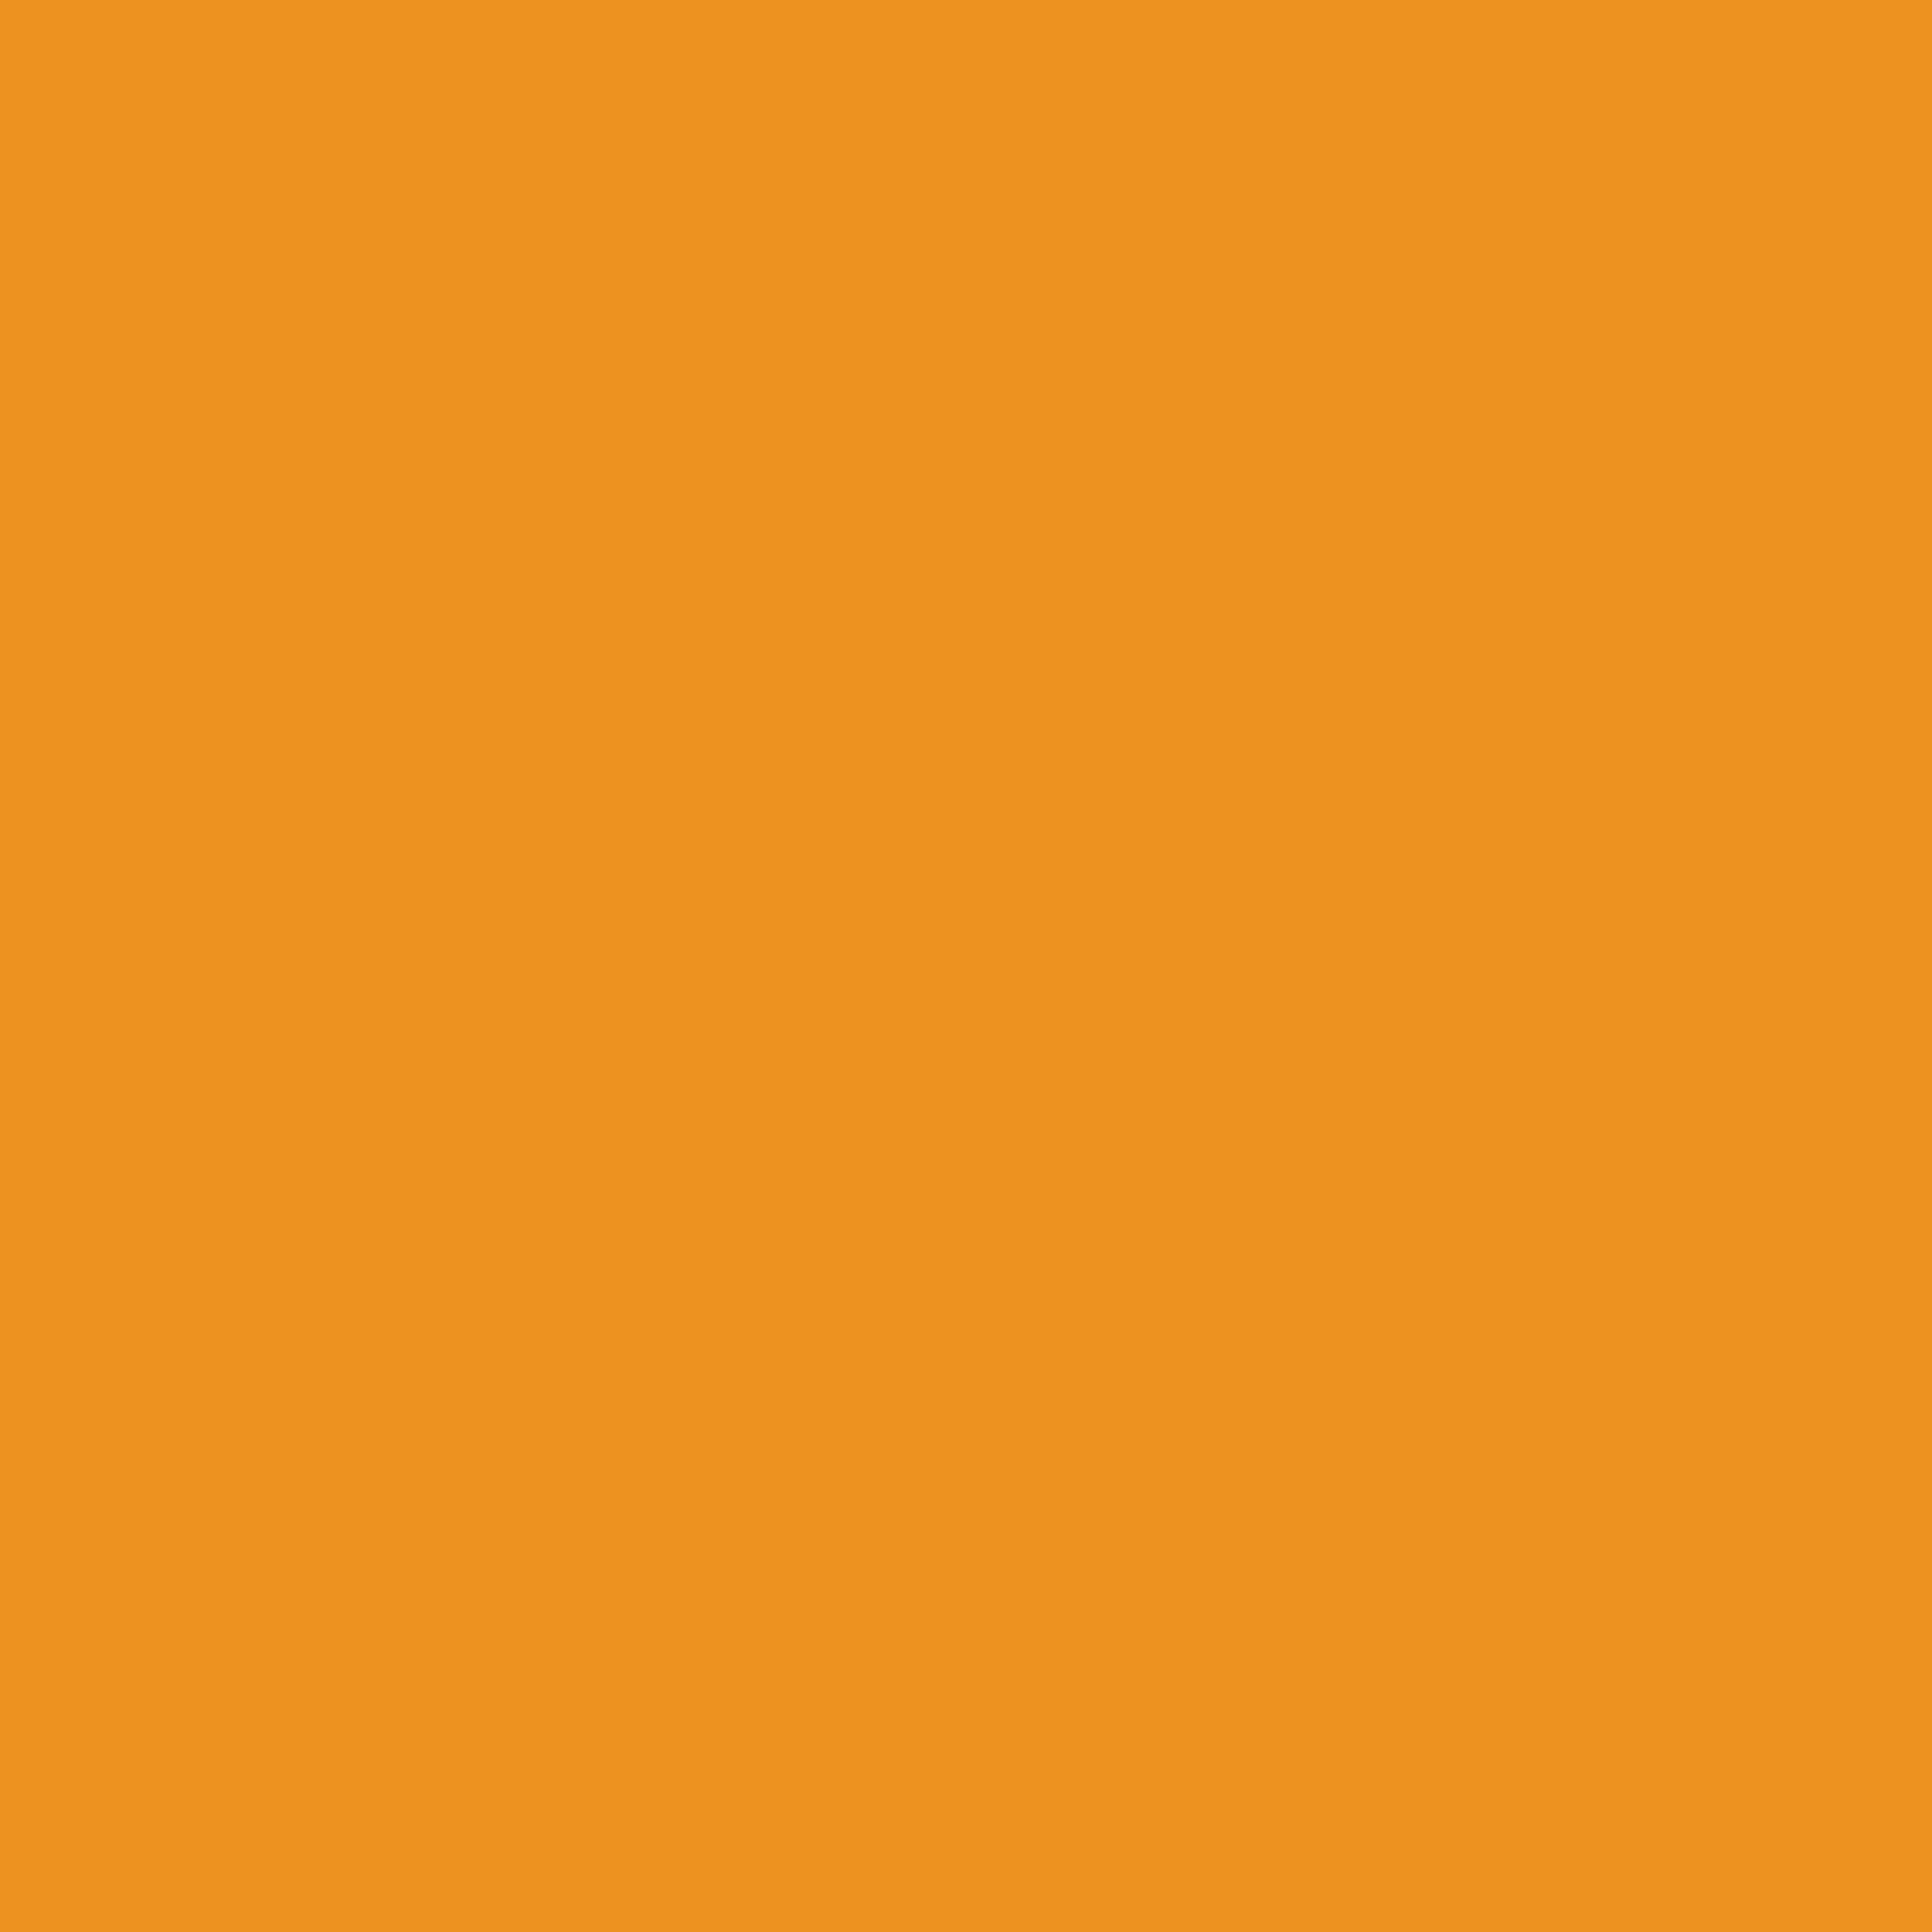 2048x2048 Carrot Orange Solid Color Background